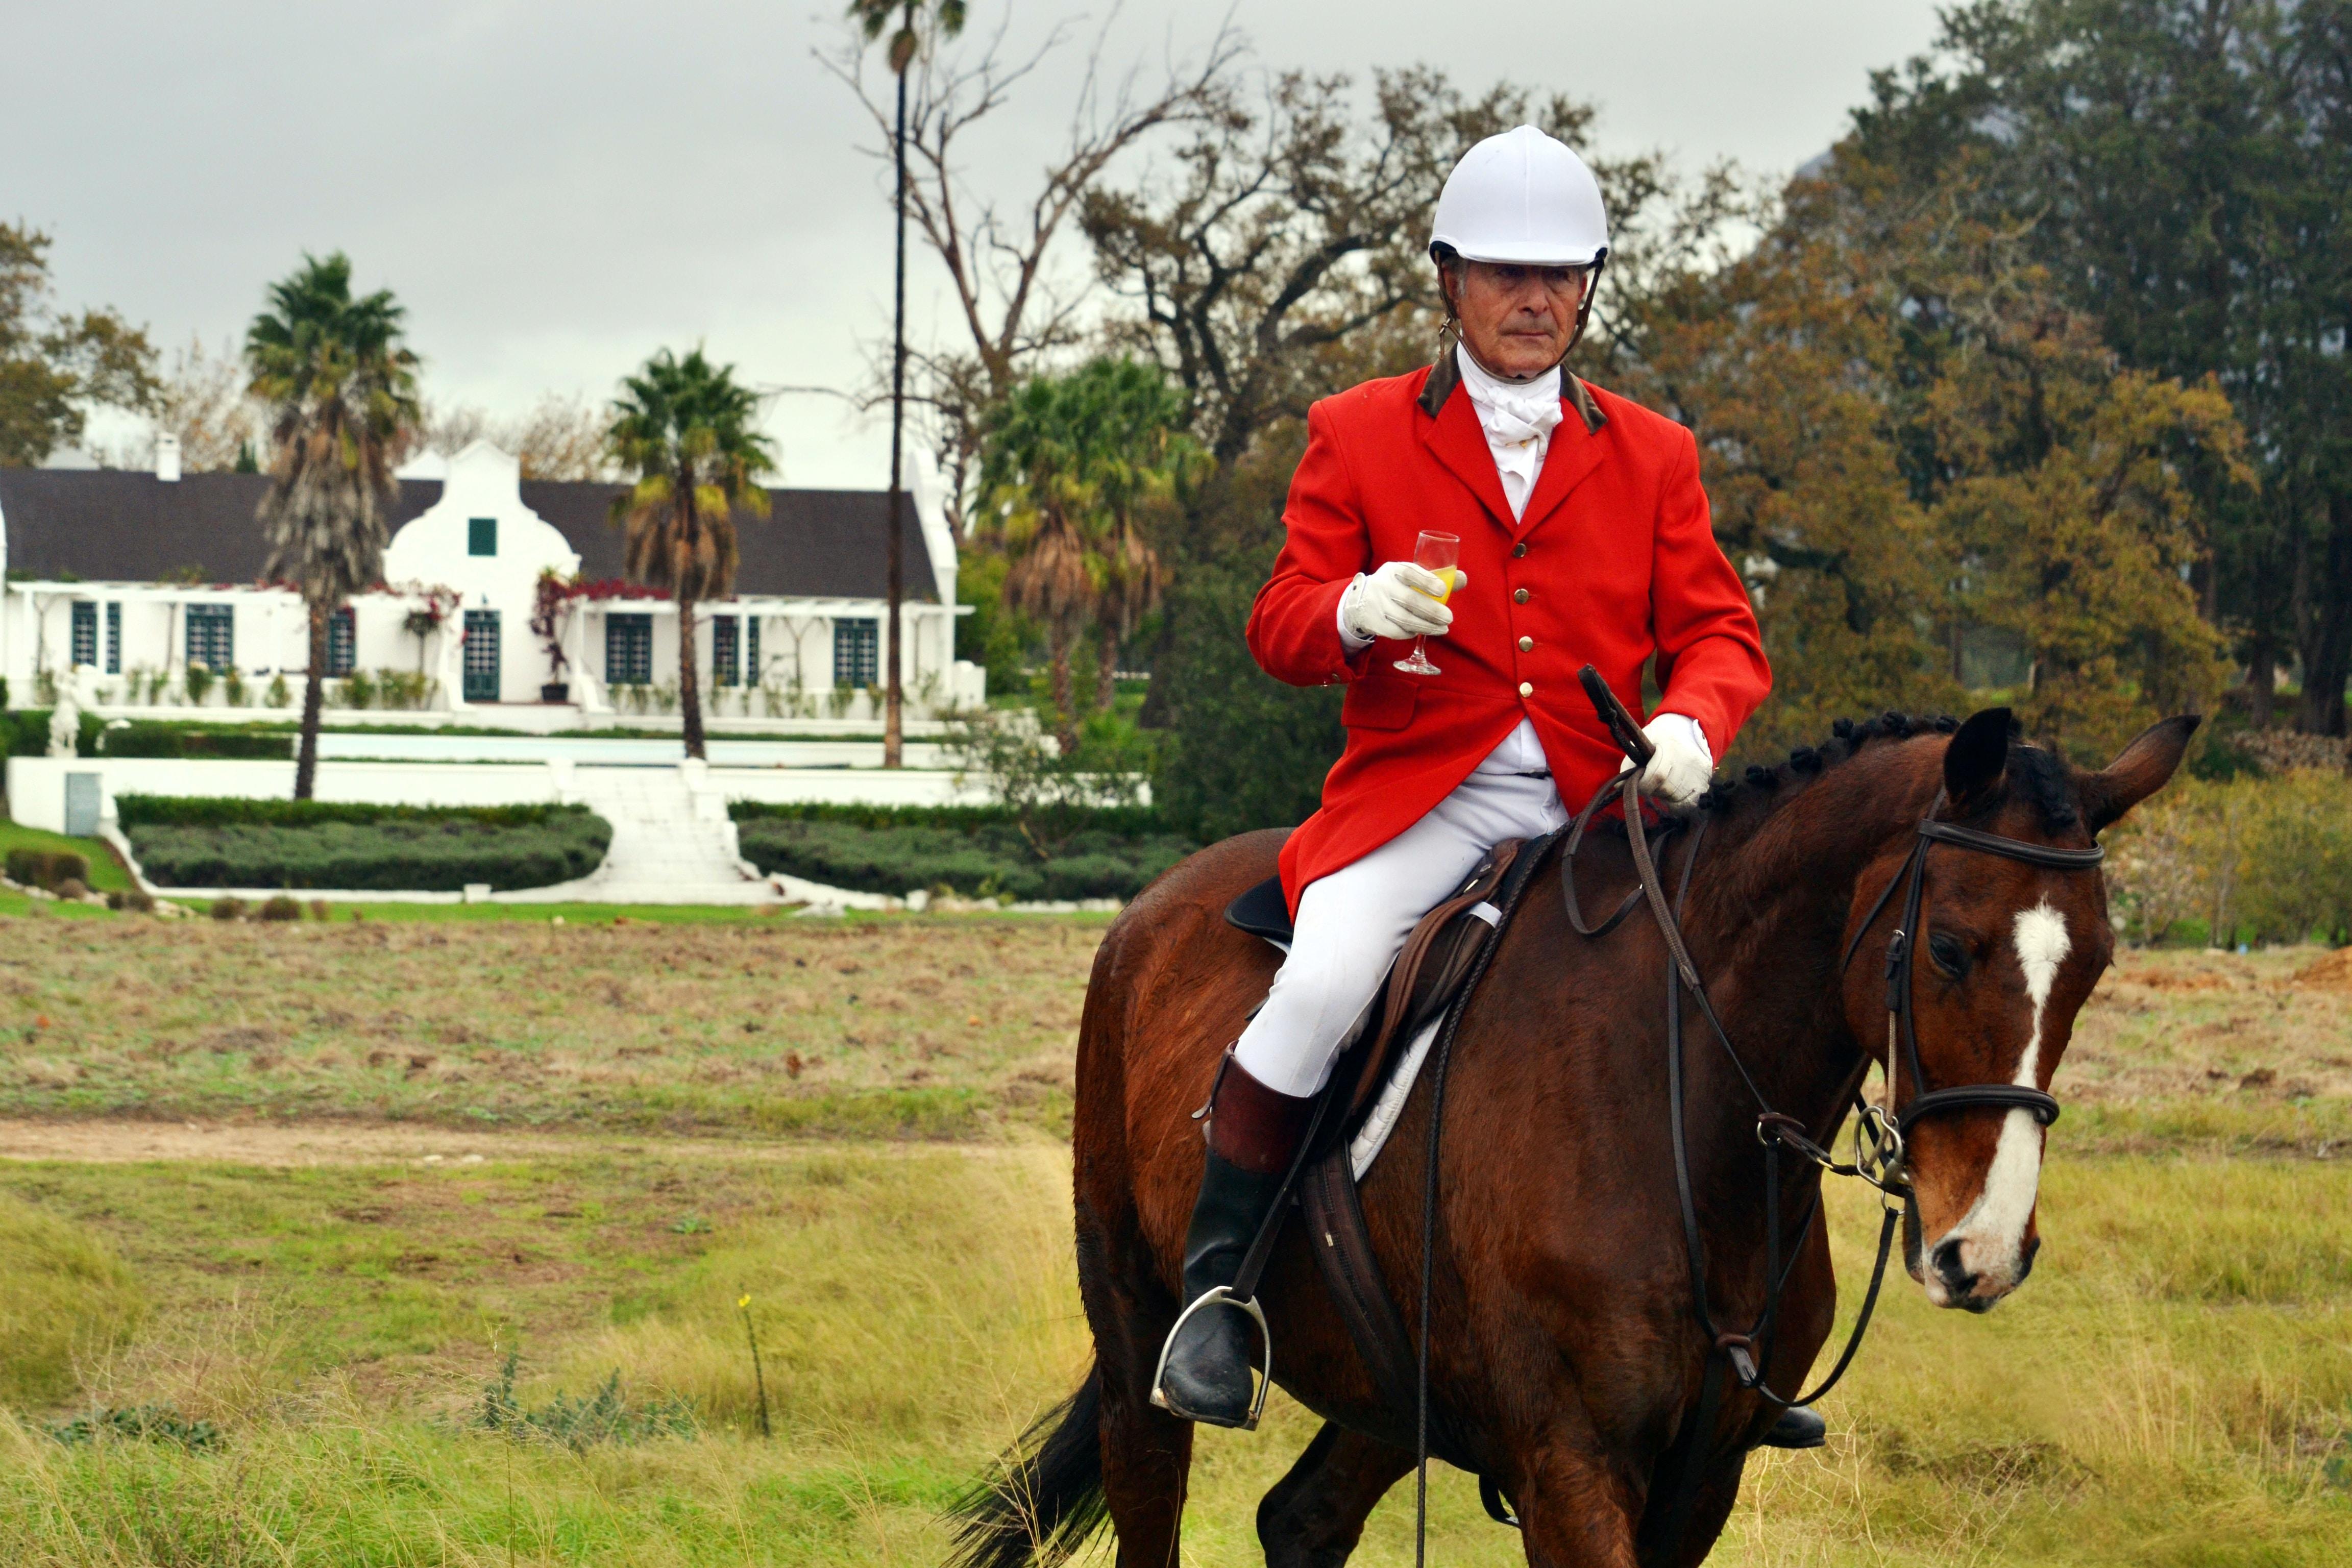 man riding horse on farm during daytime